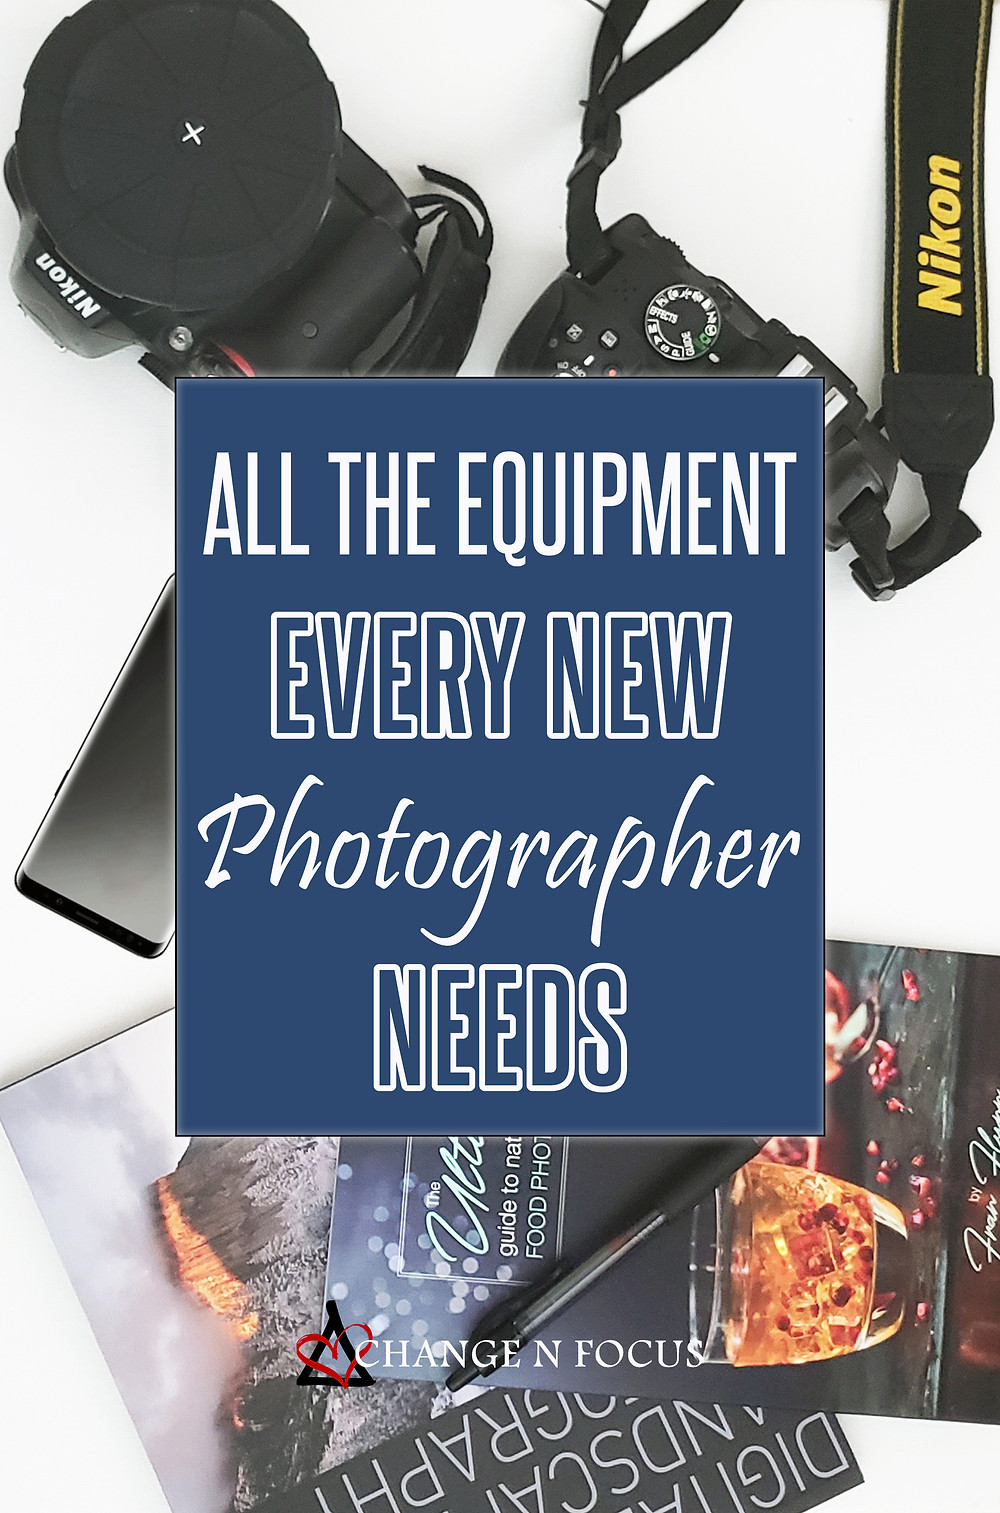 all equipment ever new photographer needs